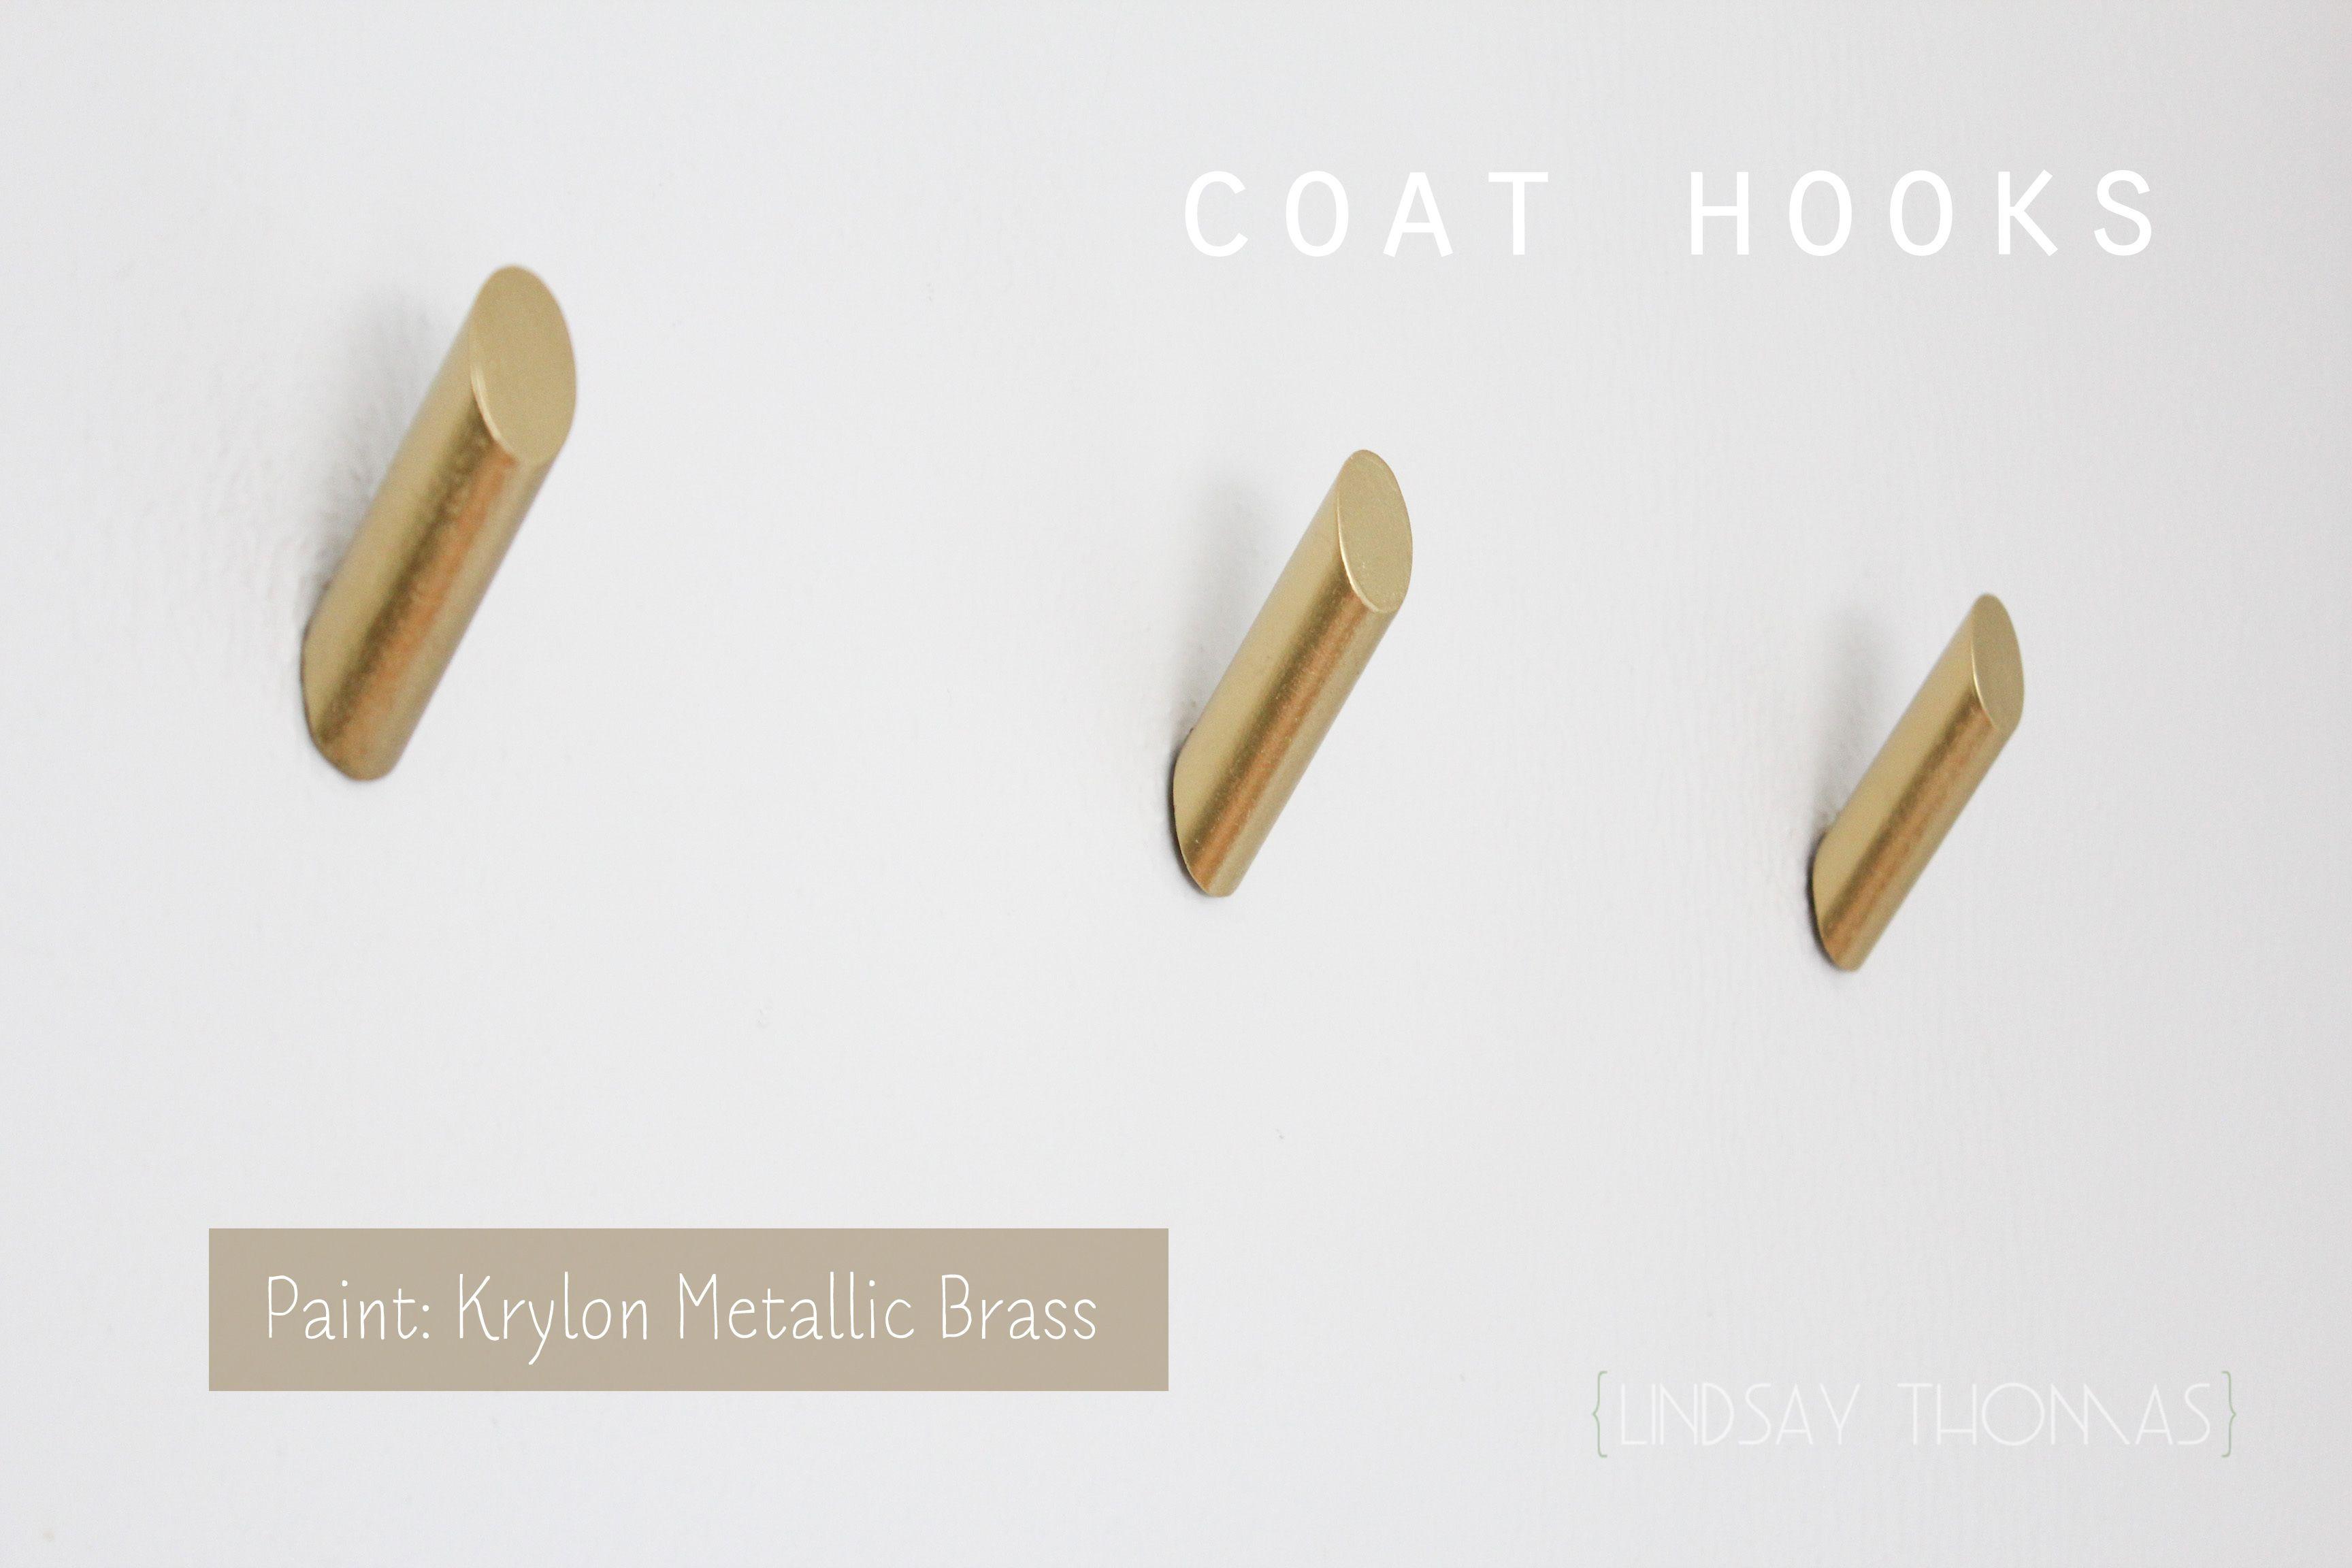 Diy Coat Hooks Made With 1 Inch Dowels And Krylon Metallic Brass Spray Paint Diy Coat Hooks Coat Hooks Diy Coat